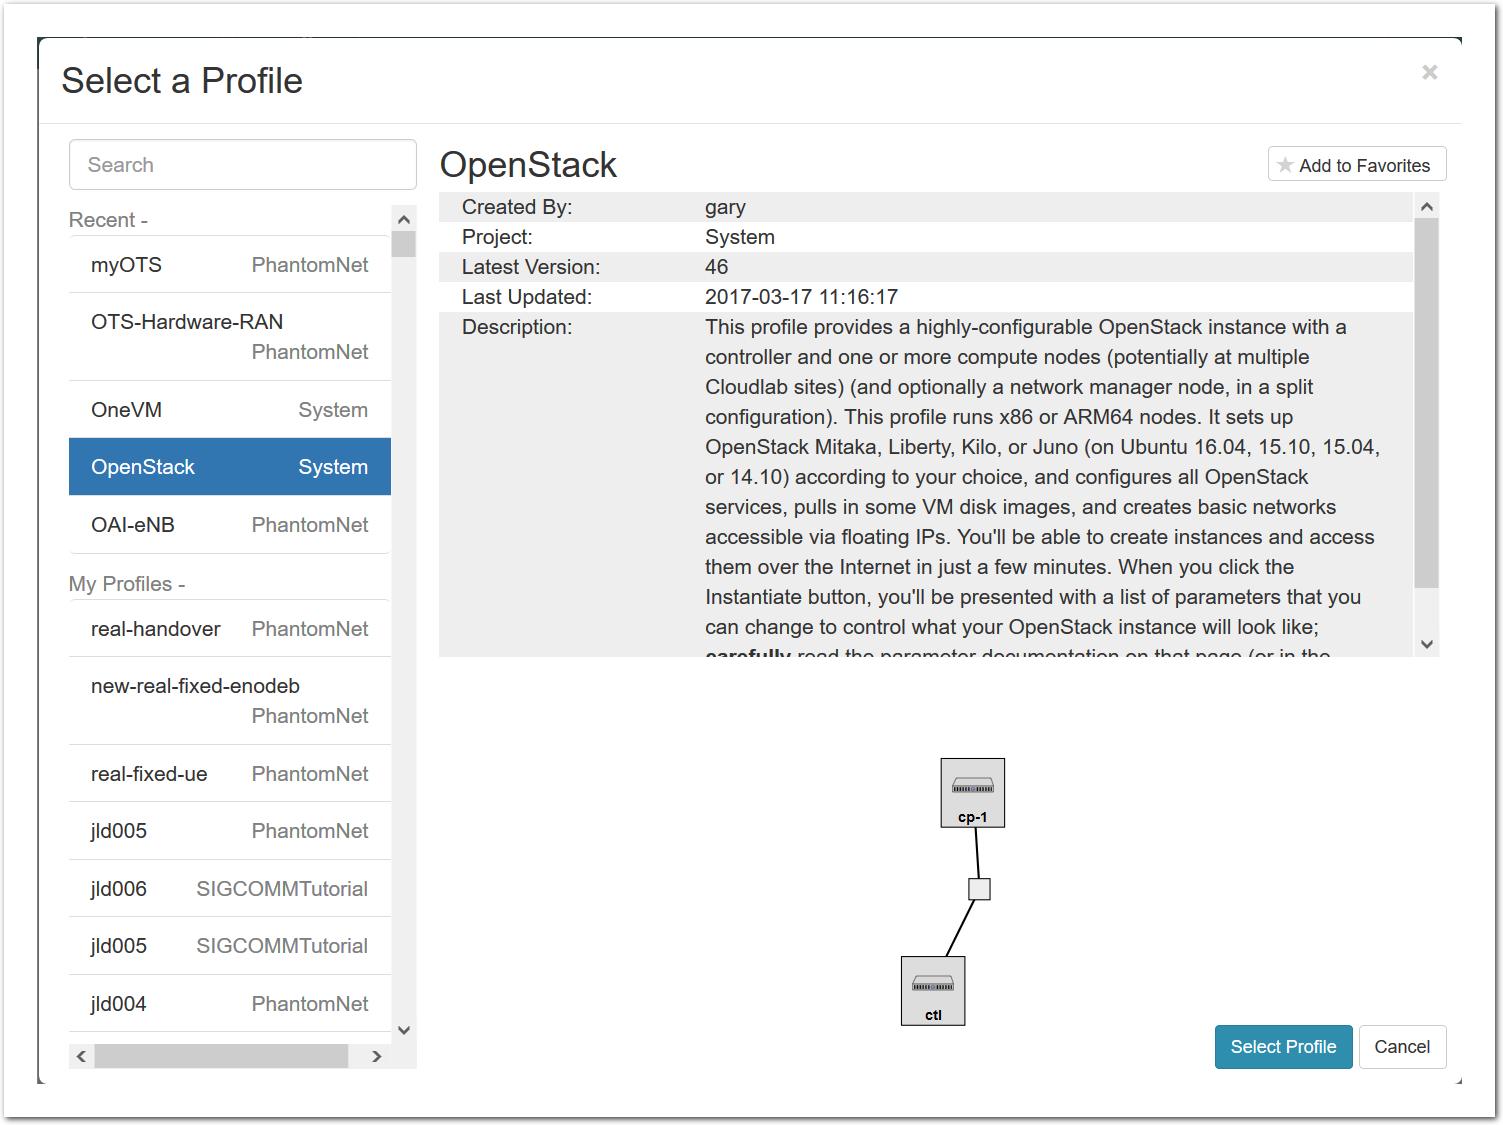 screenshots/clab/select-profile.png